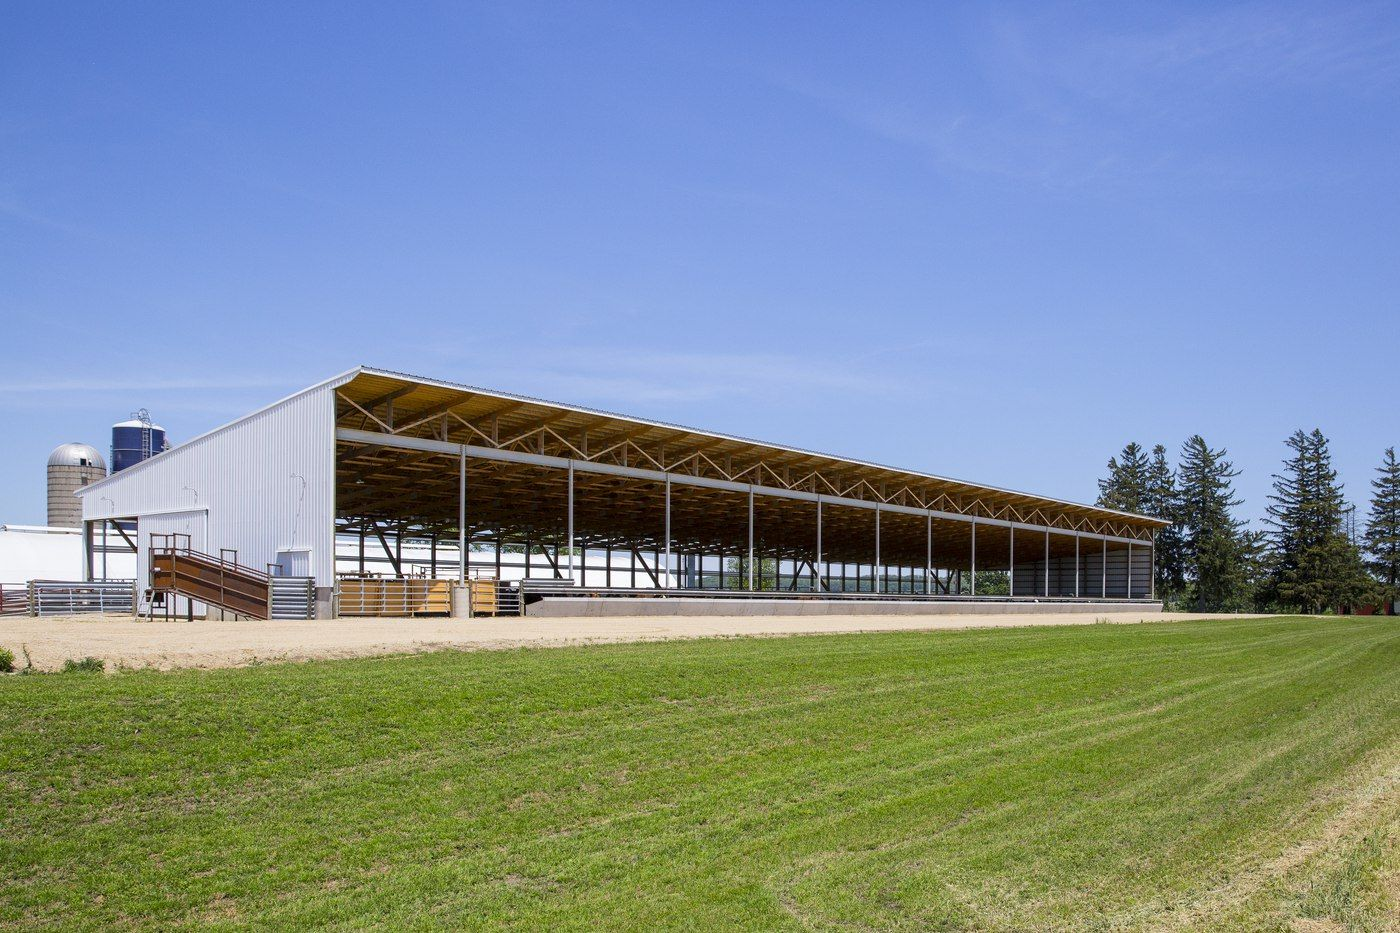 Brad Mapes_Slatted Facility_Monoslope Beef Barn